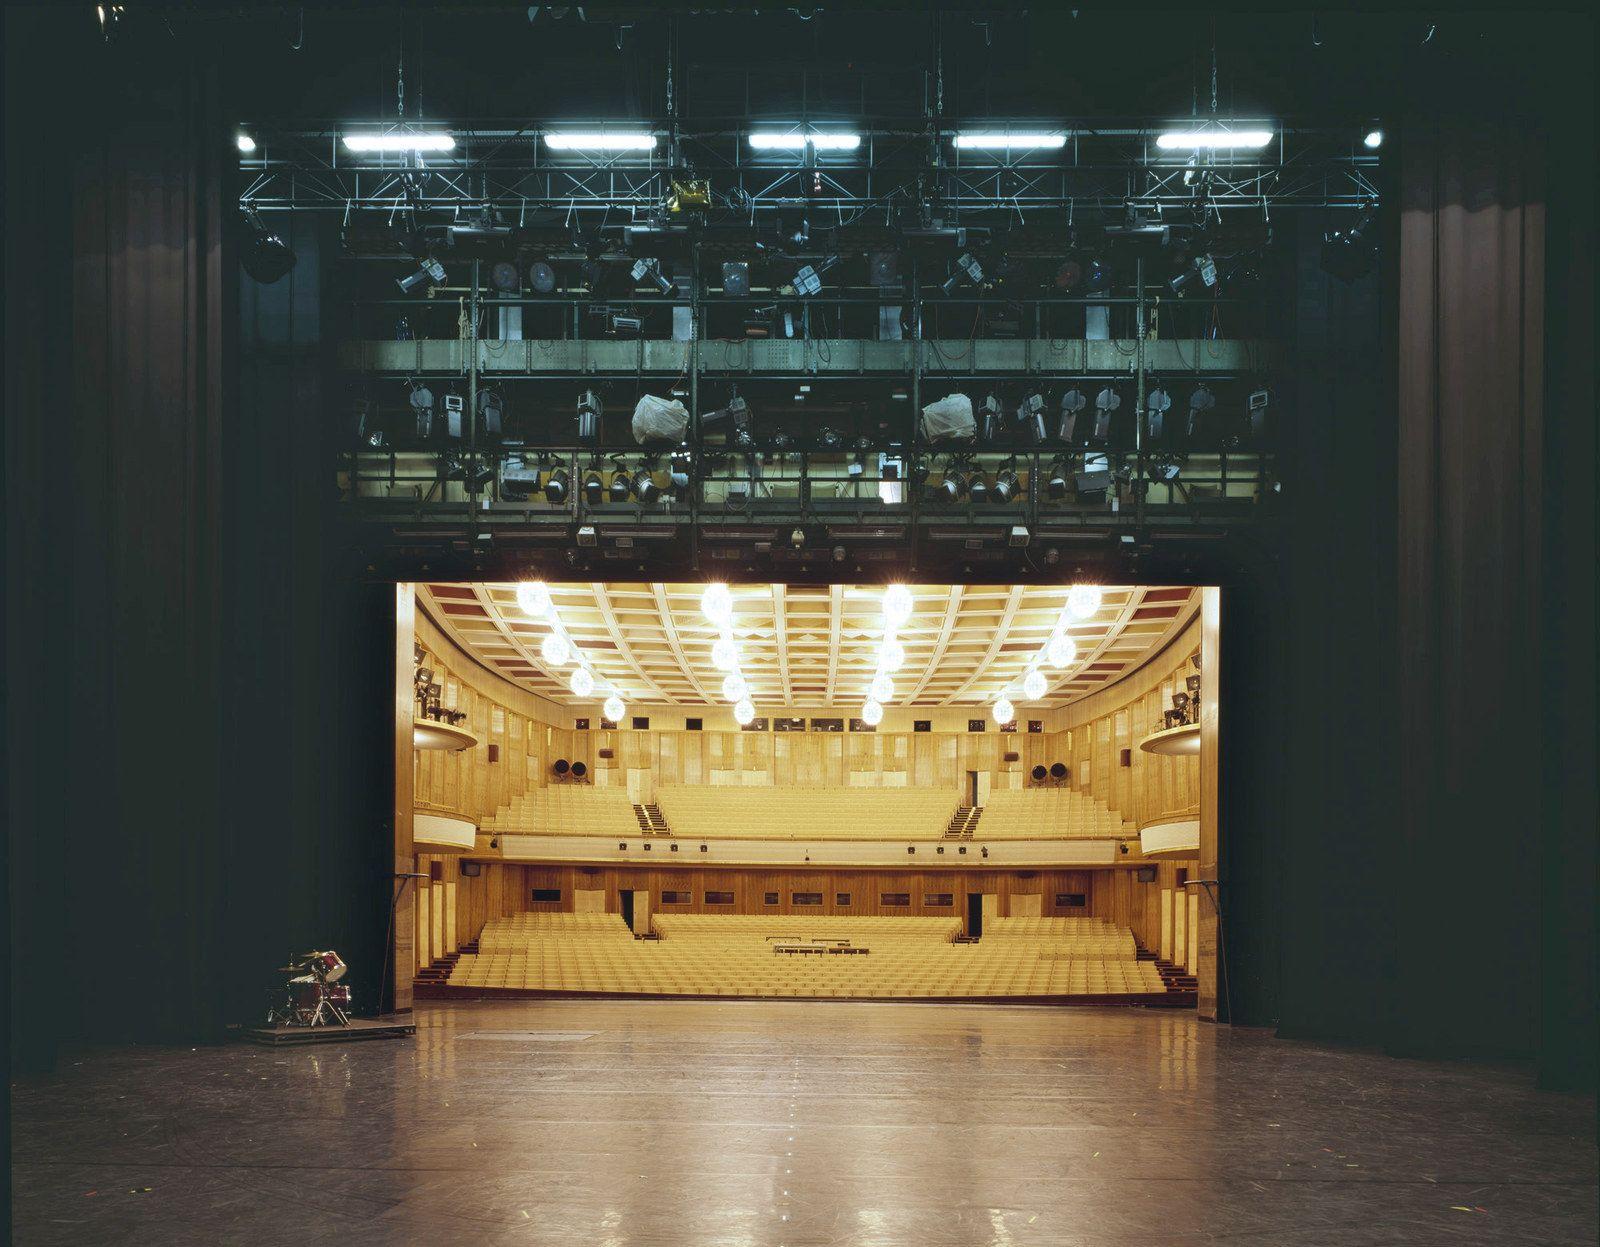 Photographer Klaus Frahm Has Documented The Eye Opening Views Seen From Theatre Stages Escenario Fotos Escenario Teatro